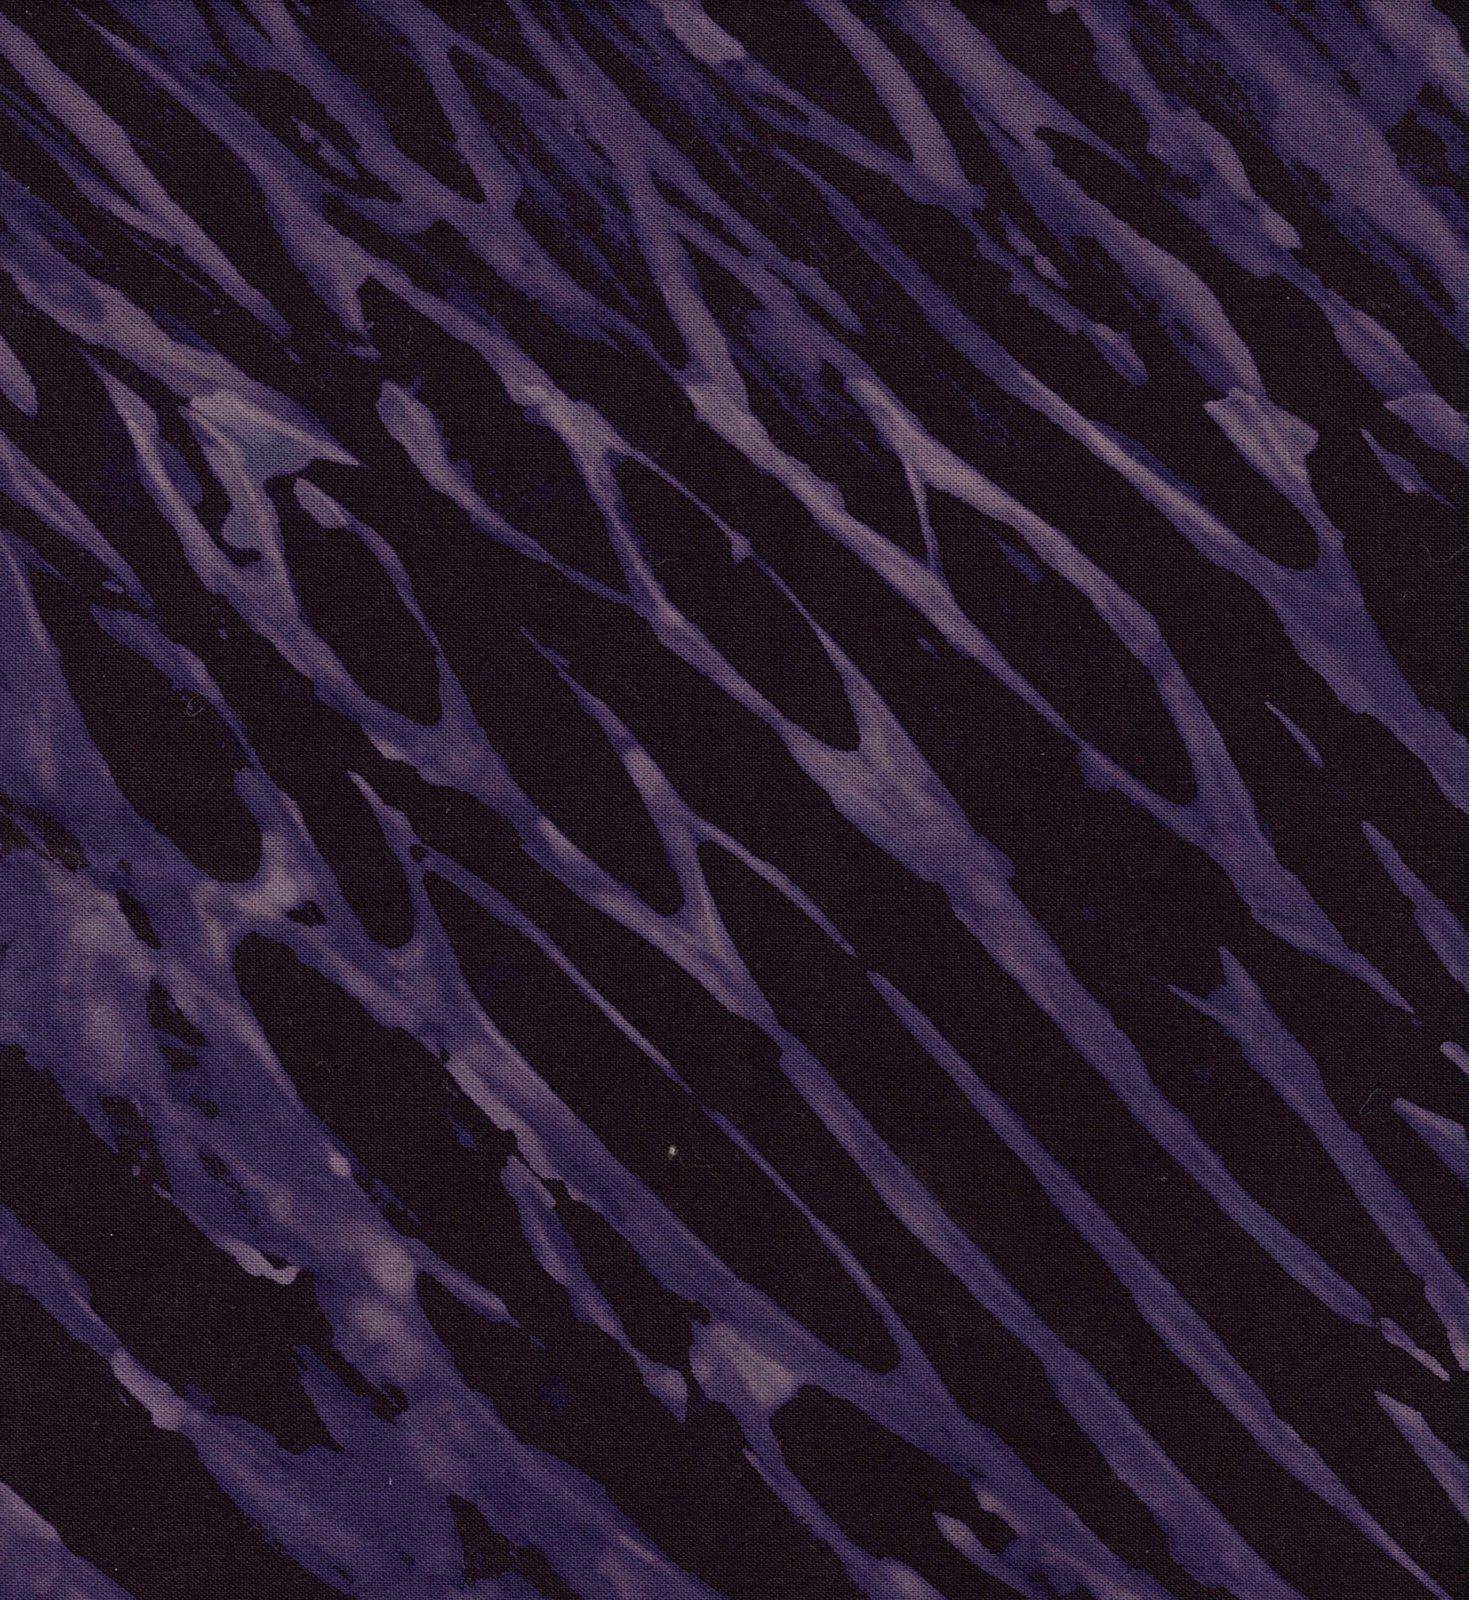 Brown/Purple Pole Wrap Shibori FQ